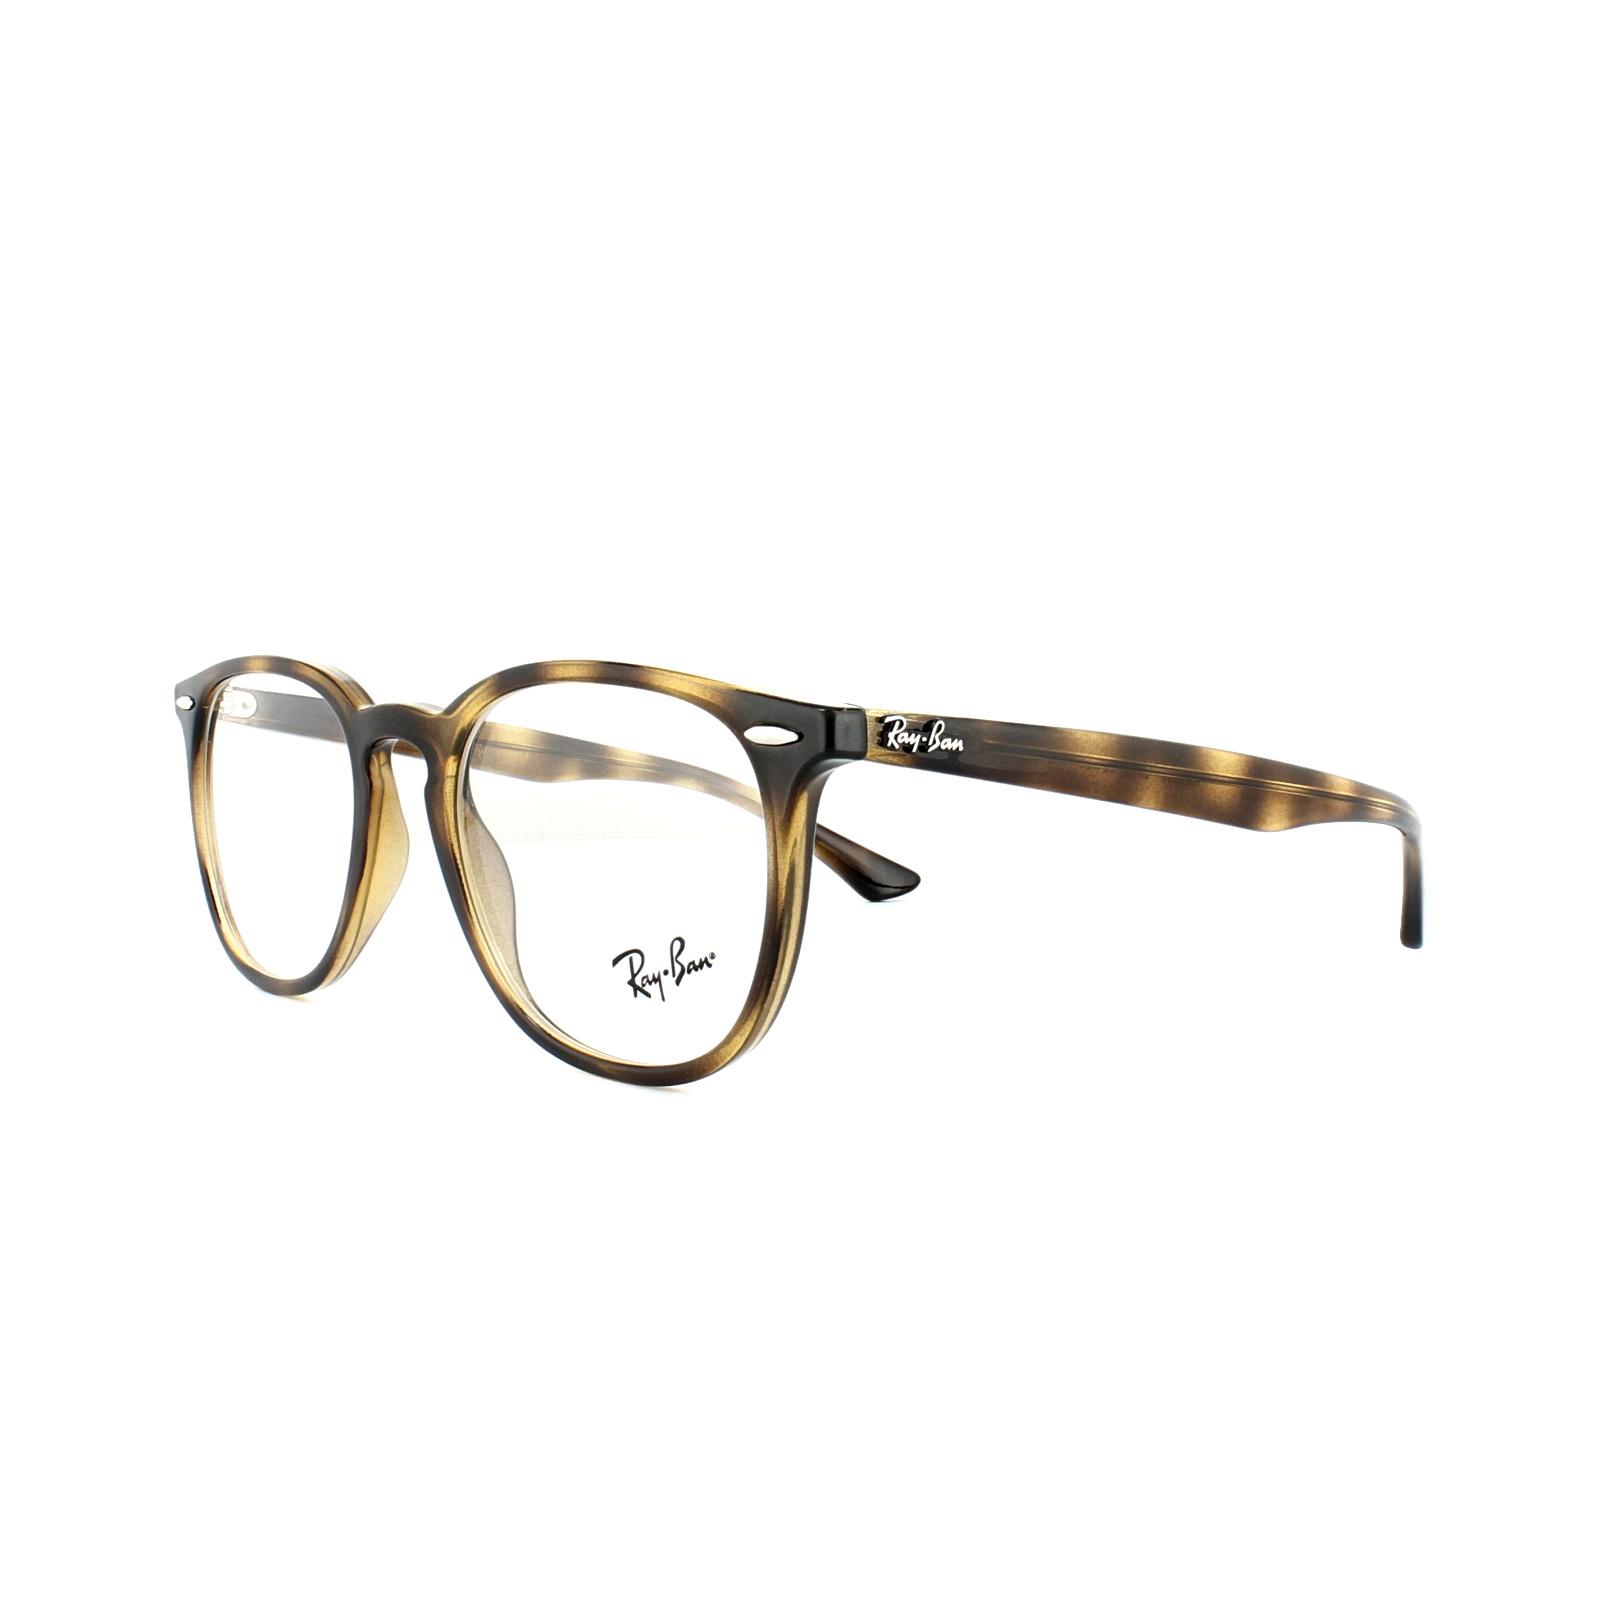 cc23d508a1a Cheap Ray-Ban 7159 Glasses Frames - Discounted Sunglasses